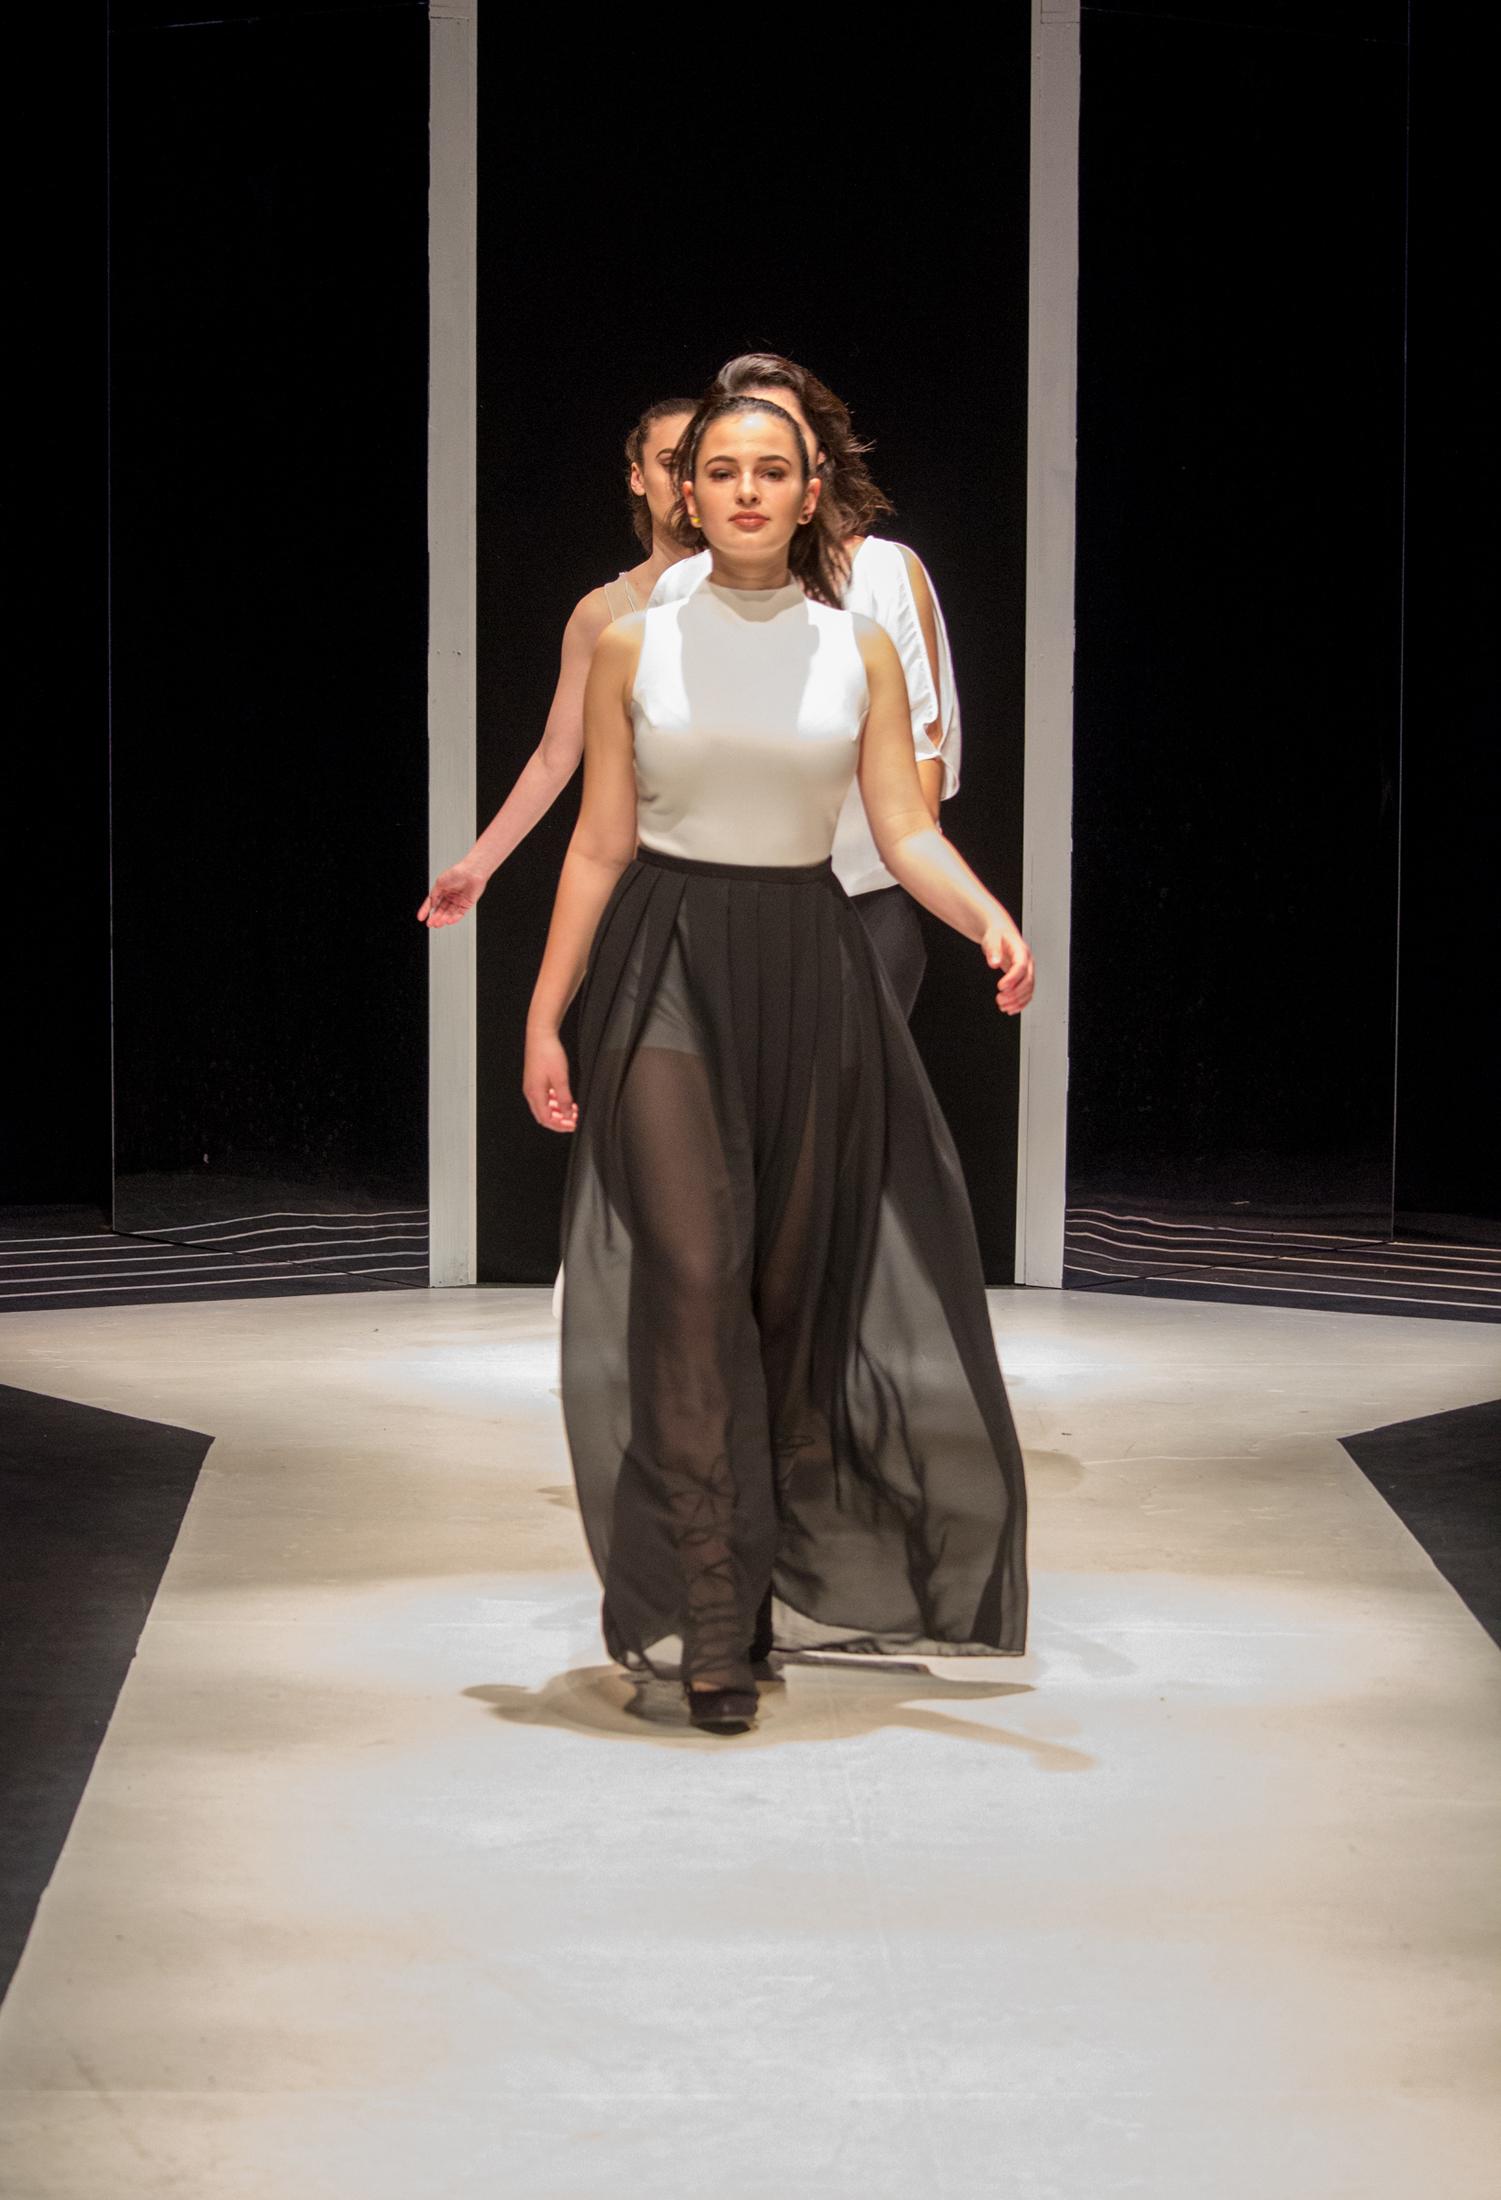 OSA-Fashion-2017-Justene Anderson-GregGutbezahl-33.jpg